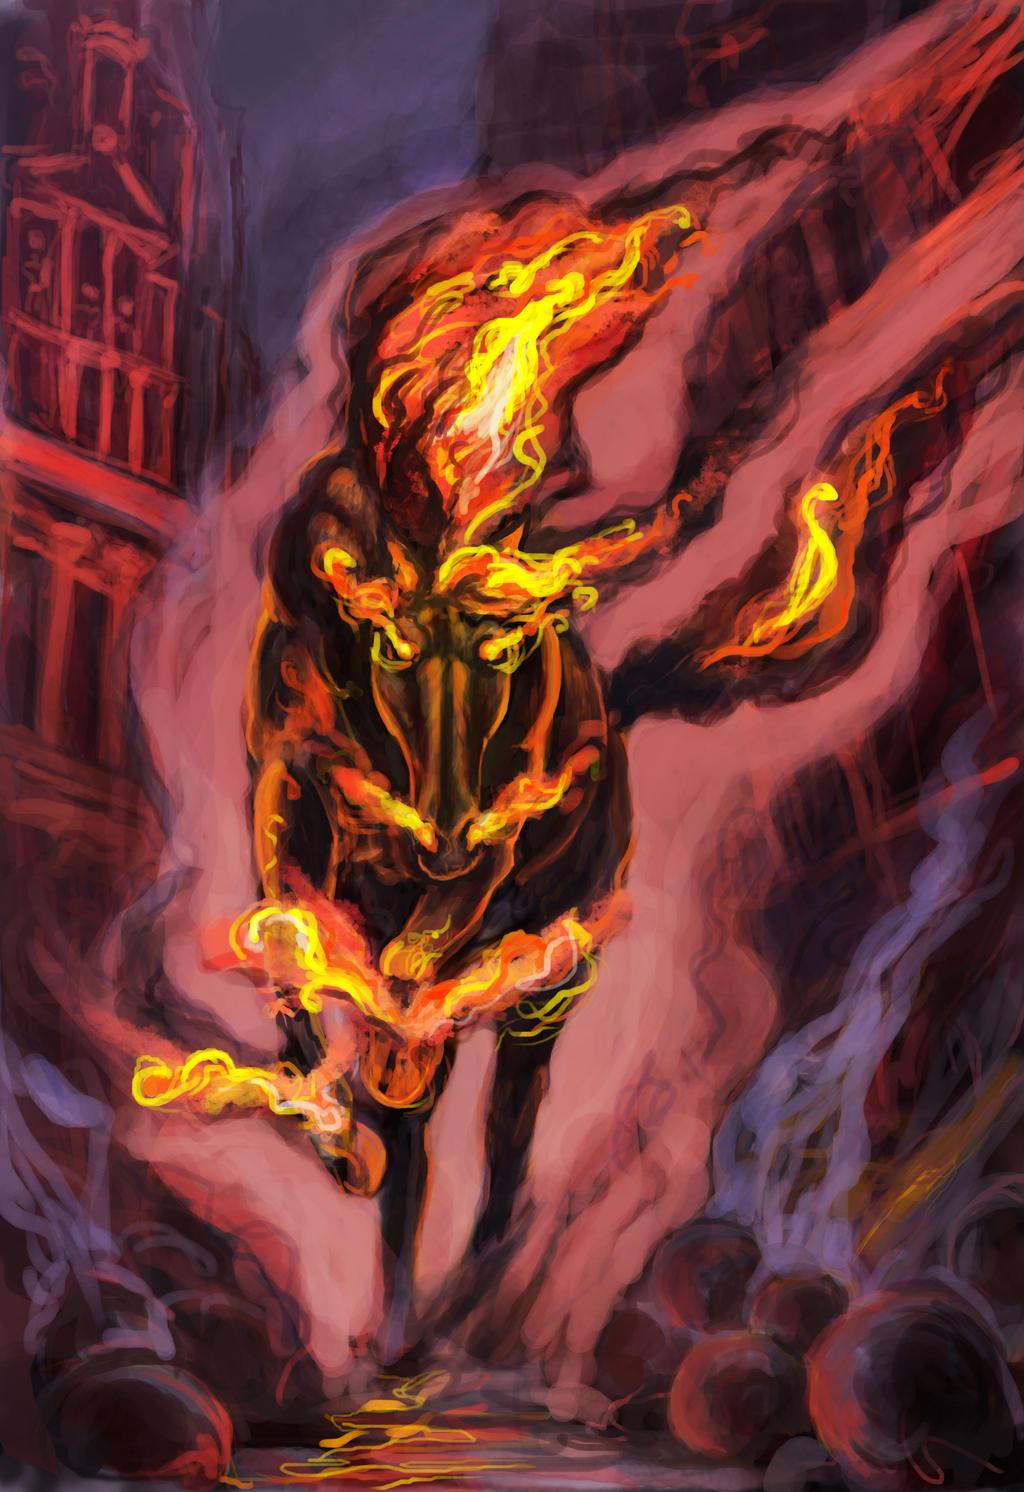 Hell horse by renata-studio